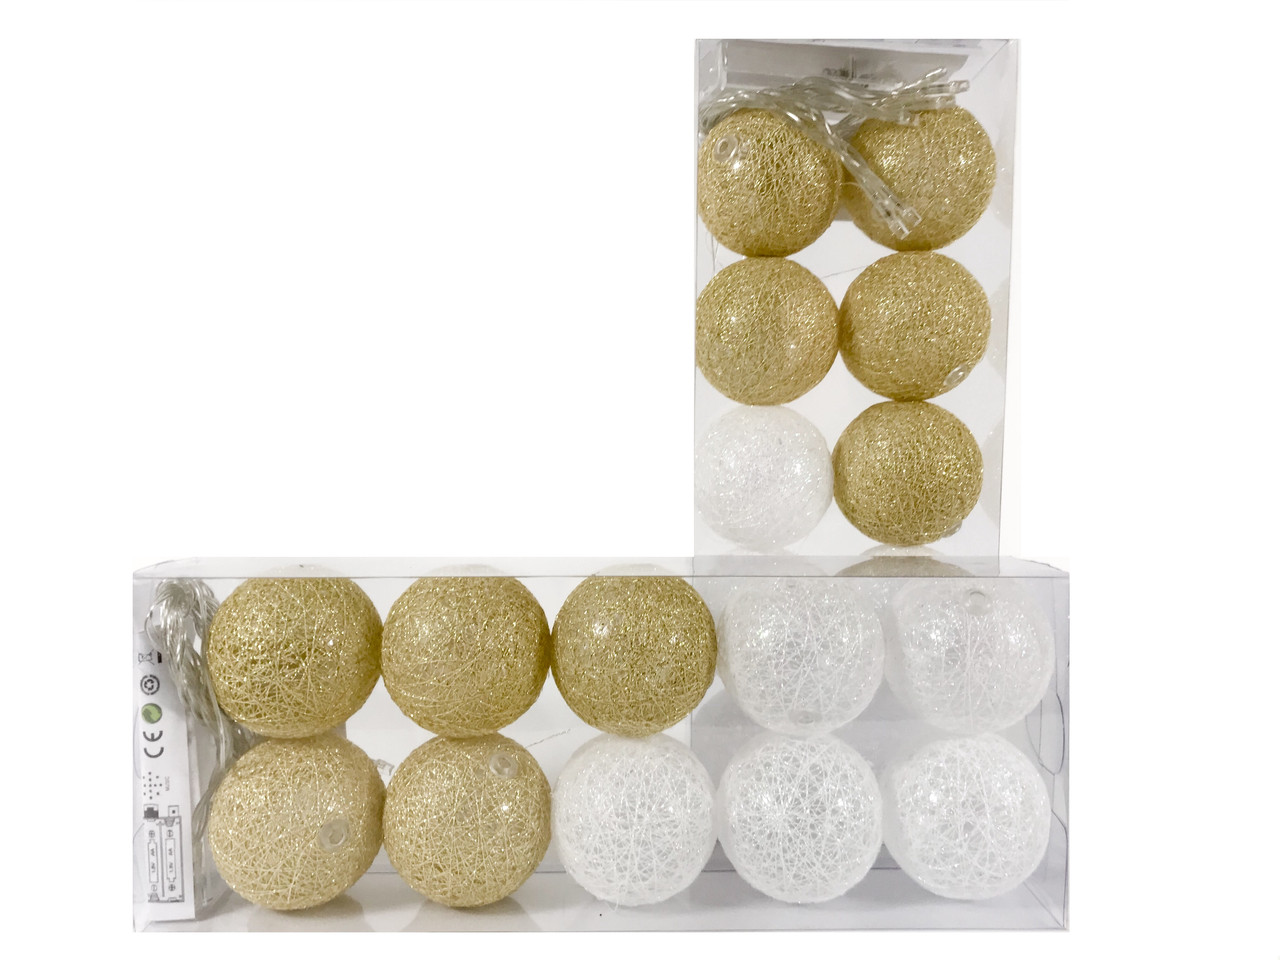 Гирлянда тайские шарики Decorino GoldWhite Cotton Balls 10led, диам 6см, длина 235см на батарейках АА